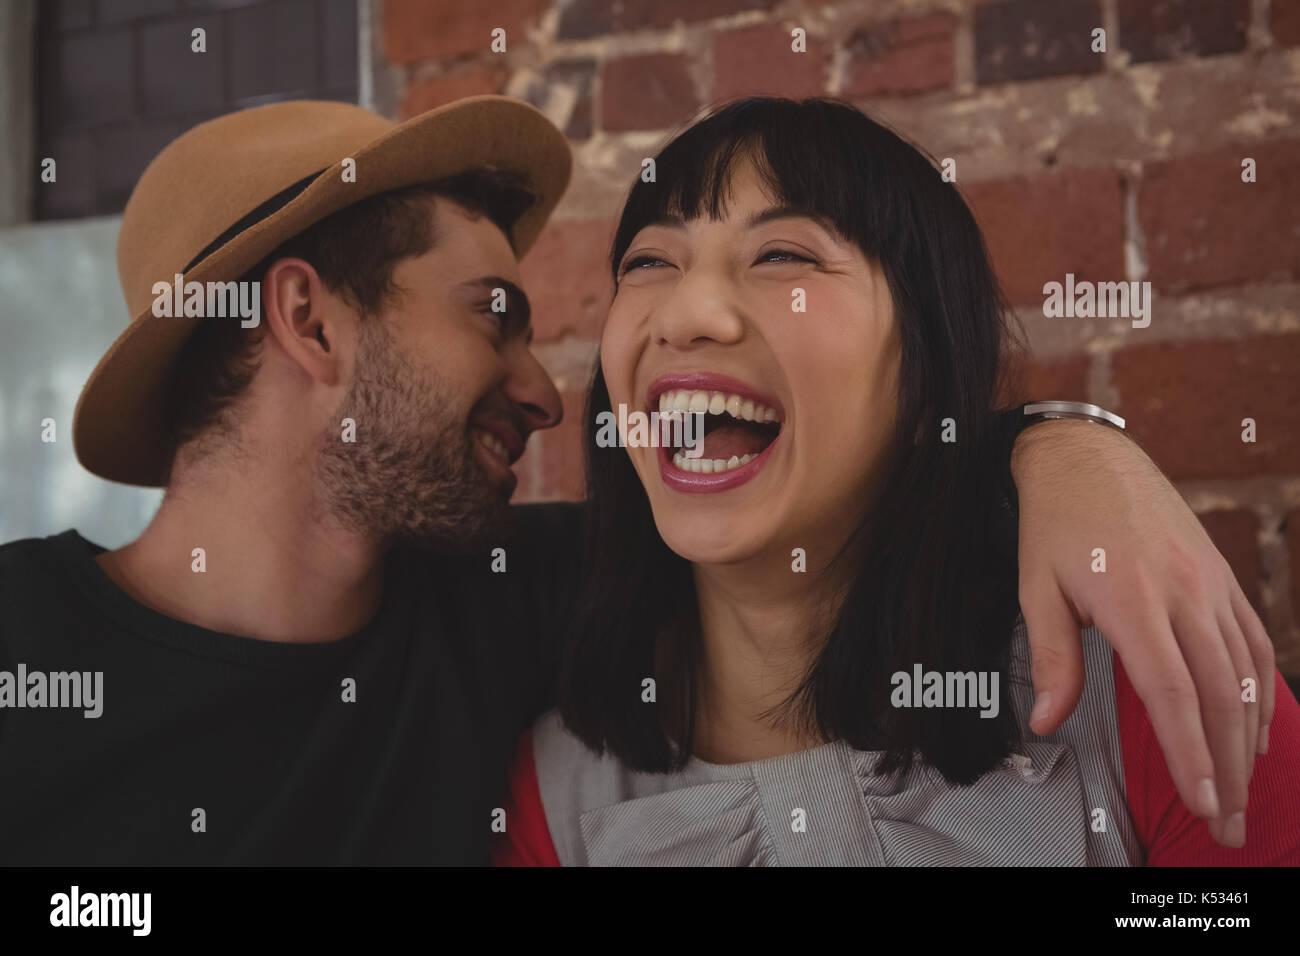 Jeune homme chuchotant à l'oreille cheerful woman at cafe Photo Stock